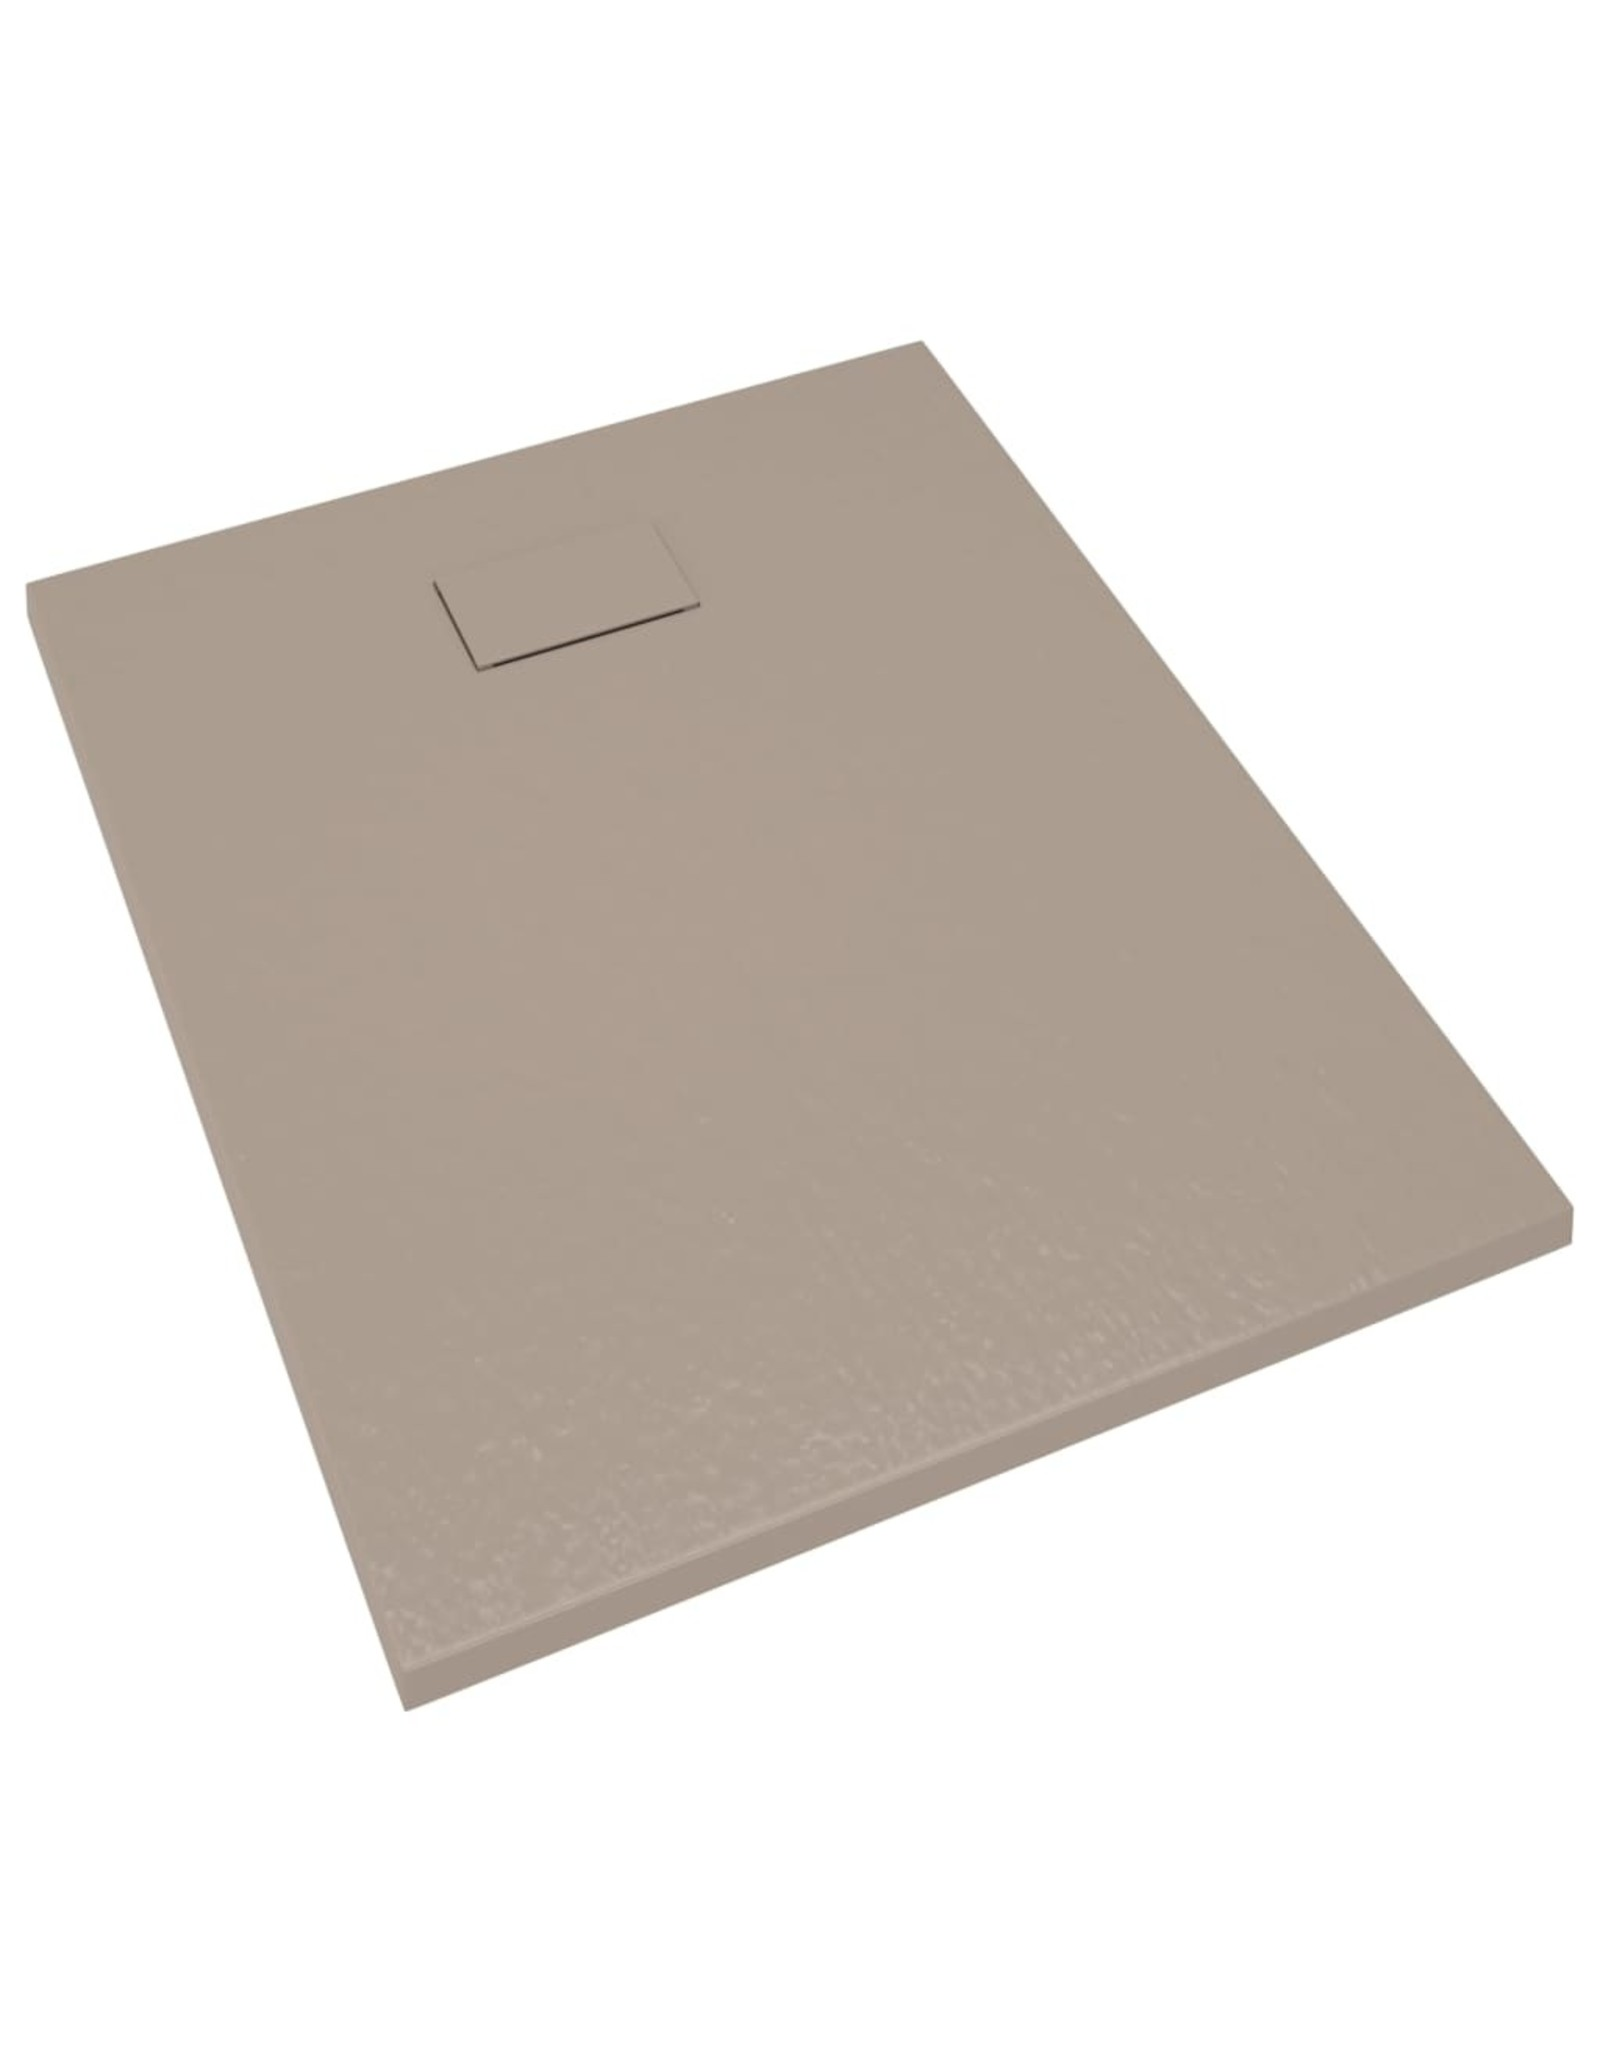 Douchebak 100x80 cm SMC bruin